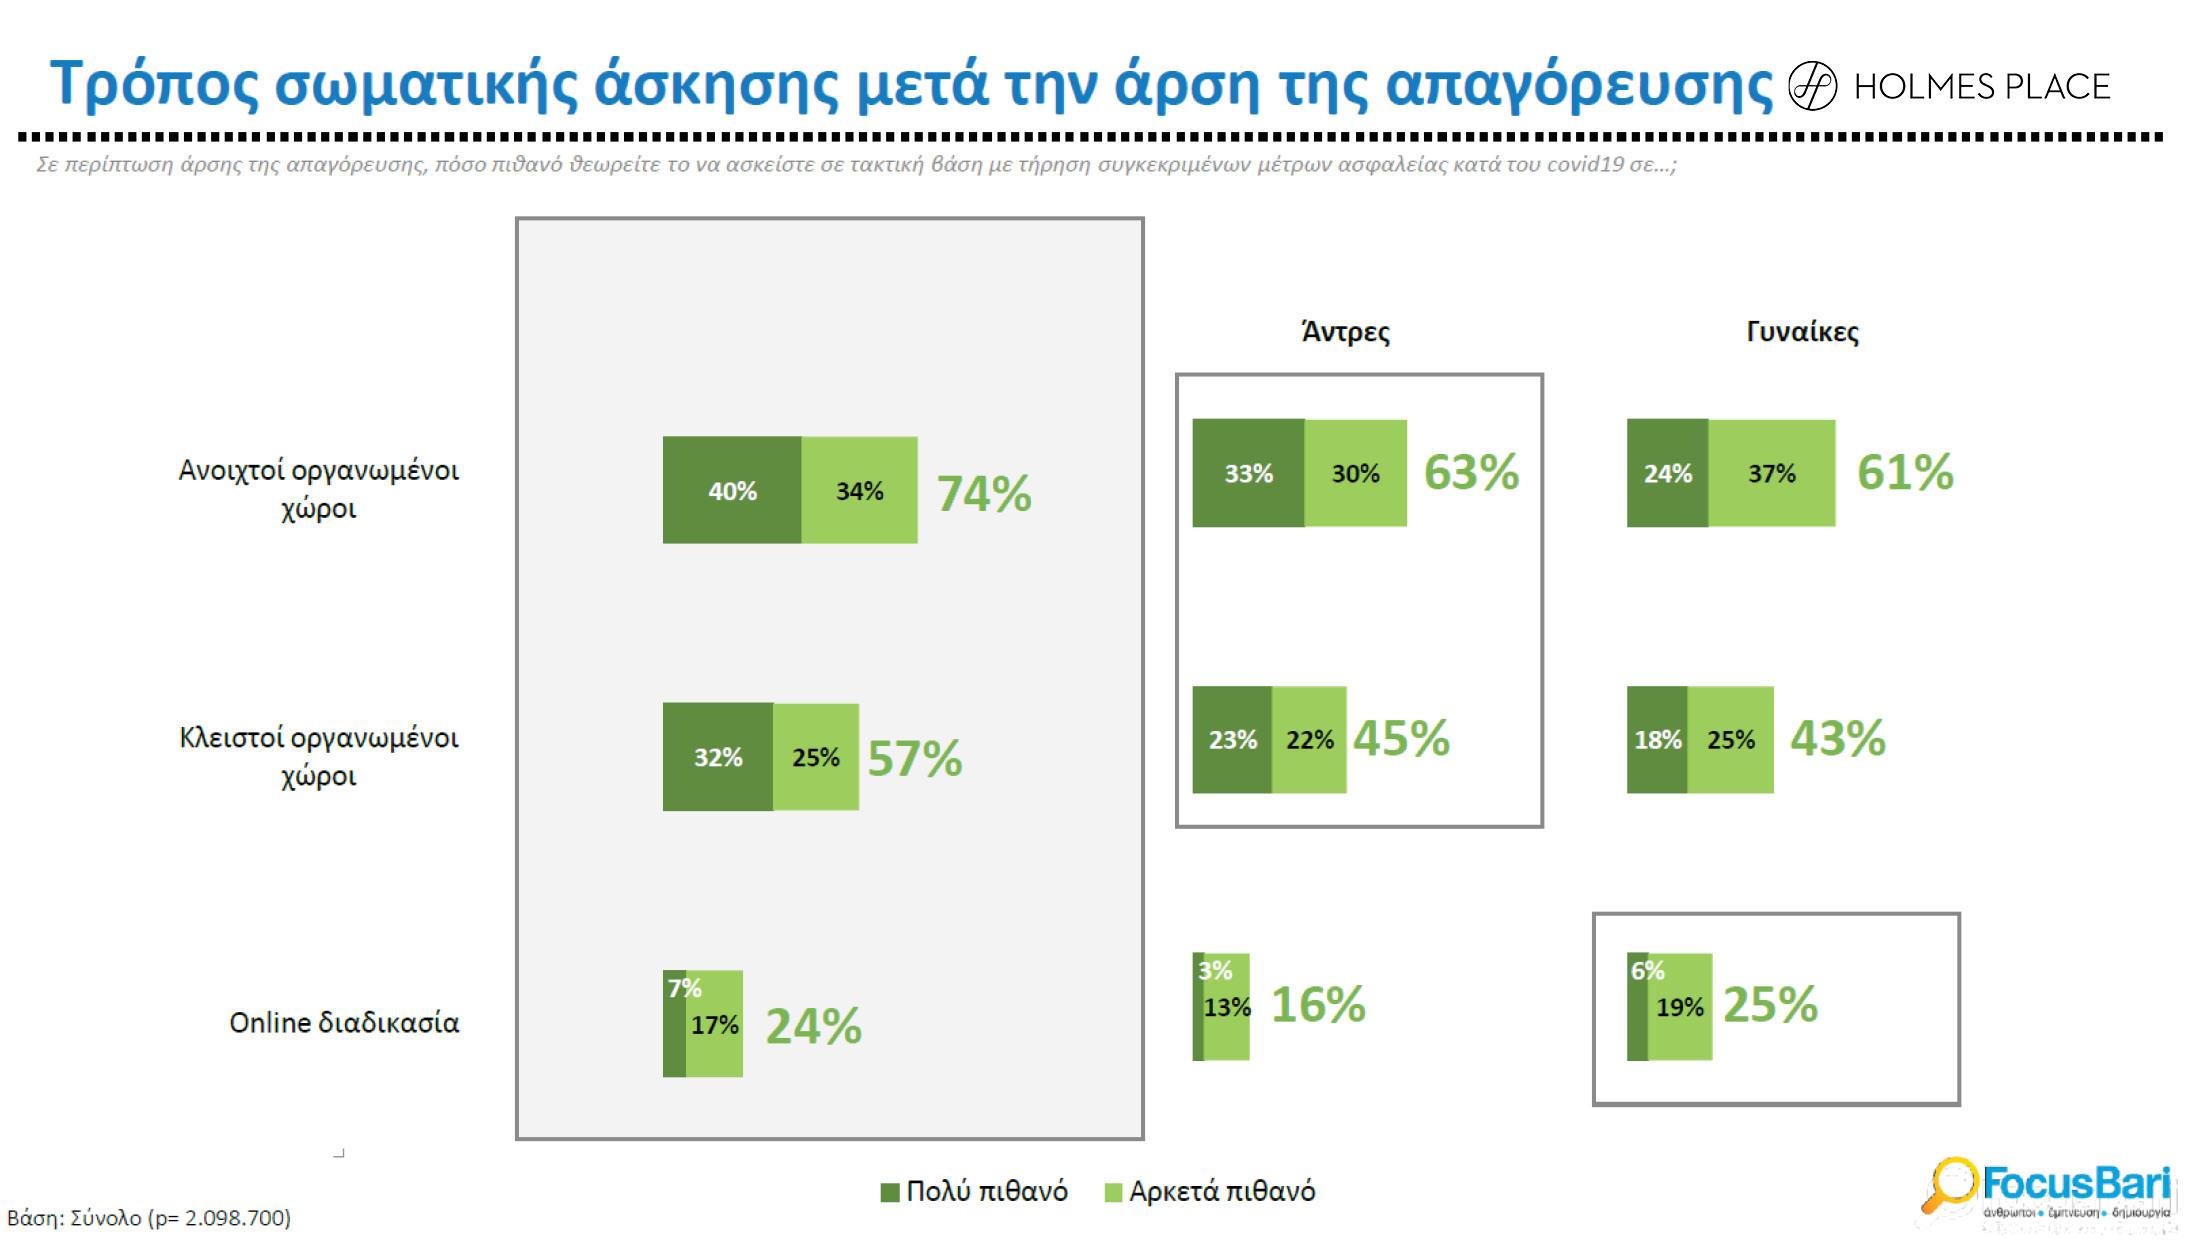 7-%cf%83%cf%84%ce%bf%cf%85%cf%82-10-%ce%ad%ce%bb%ce%bb%ce%b7%ce%bd%ce%b5%cf%82-%ce%b5%cf%80%ce%b9%ce%b8%cf%85%ce%bc%ce%bf%cf%8d%ce%bd-%cf%84%ce%b7%ce%bd-%ce%b5%cf%80%ce%b1%ce%bd%ce%b1%ce%bb%ce%b53